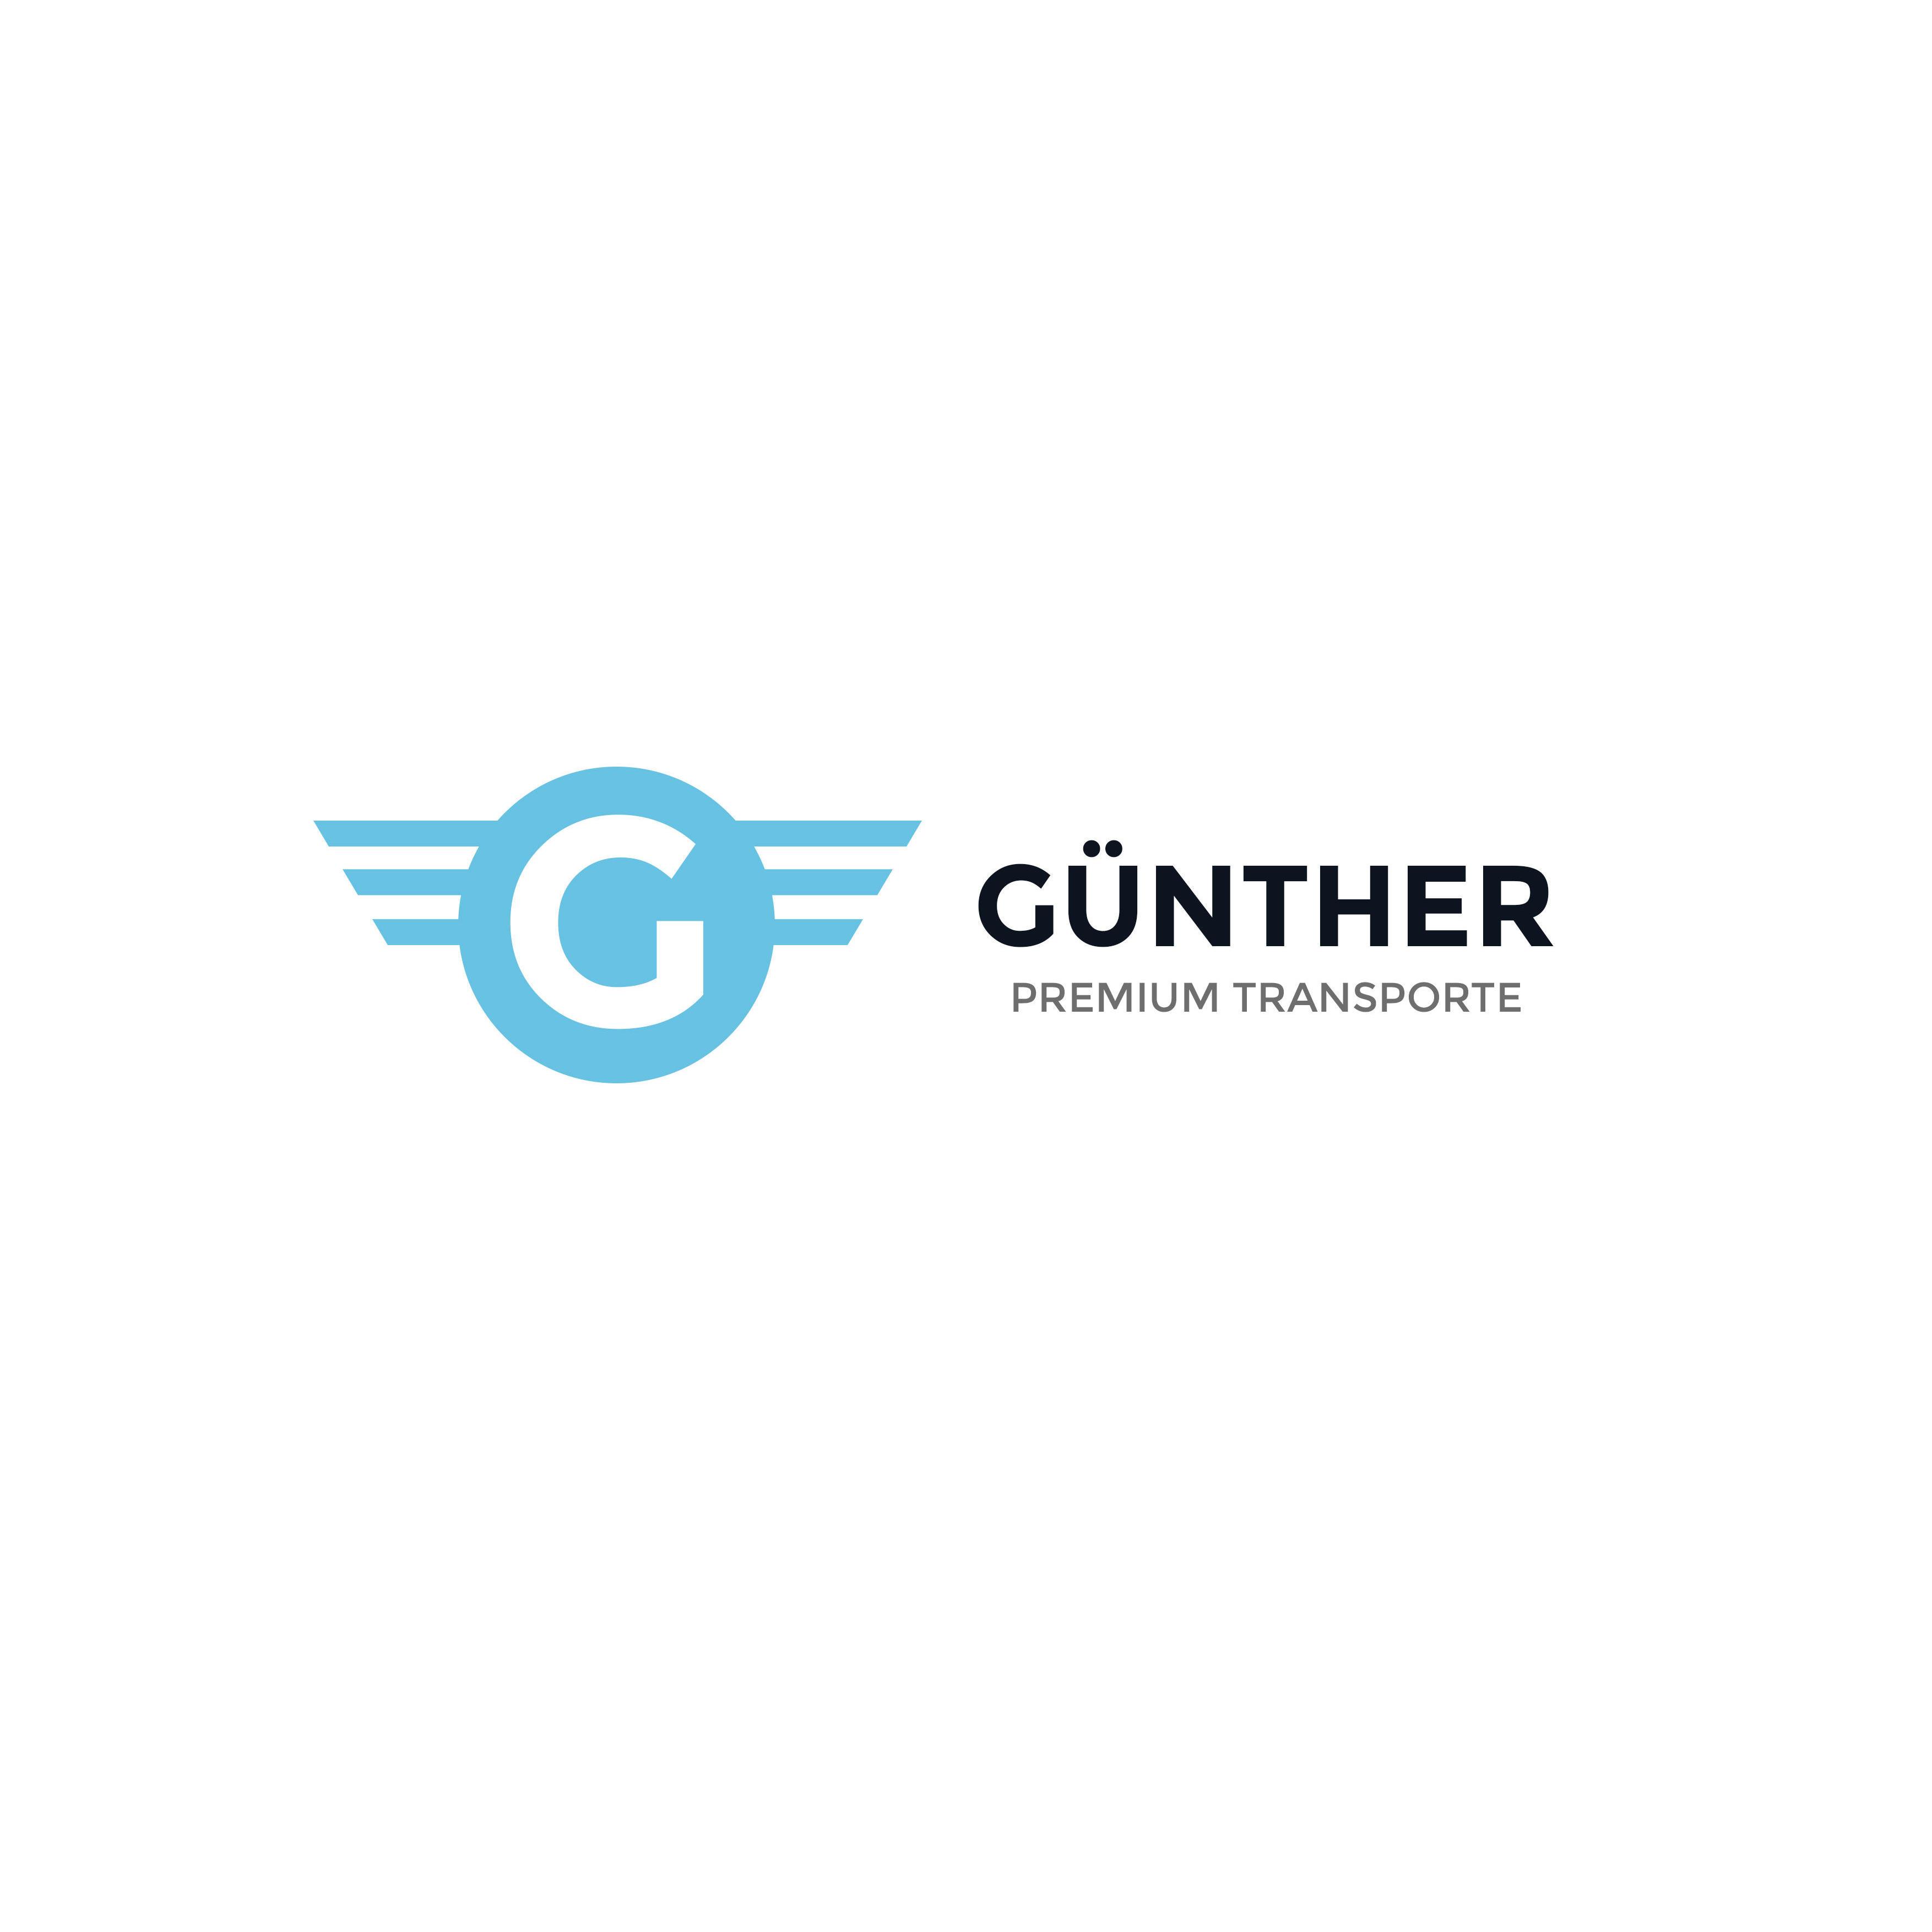 Premium Transporte Günther